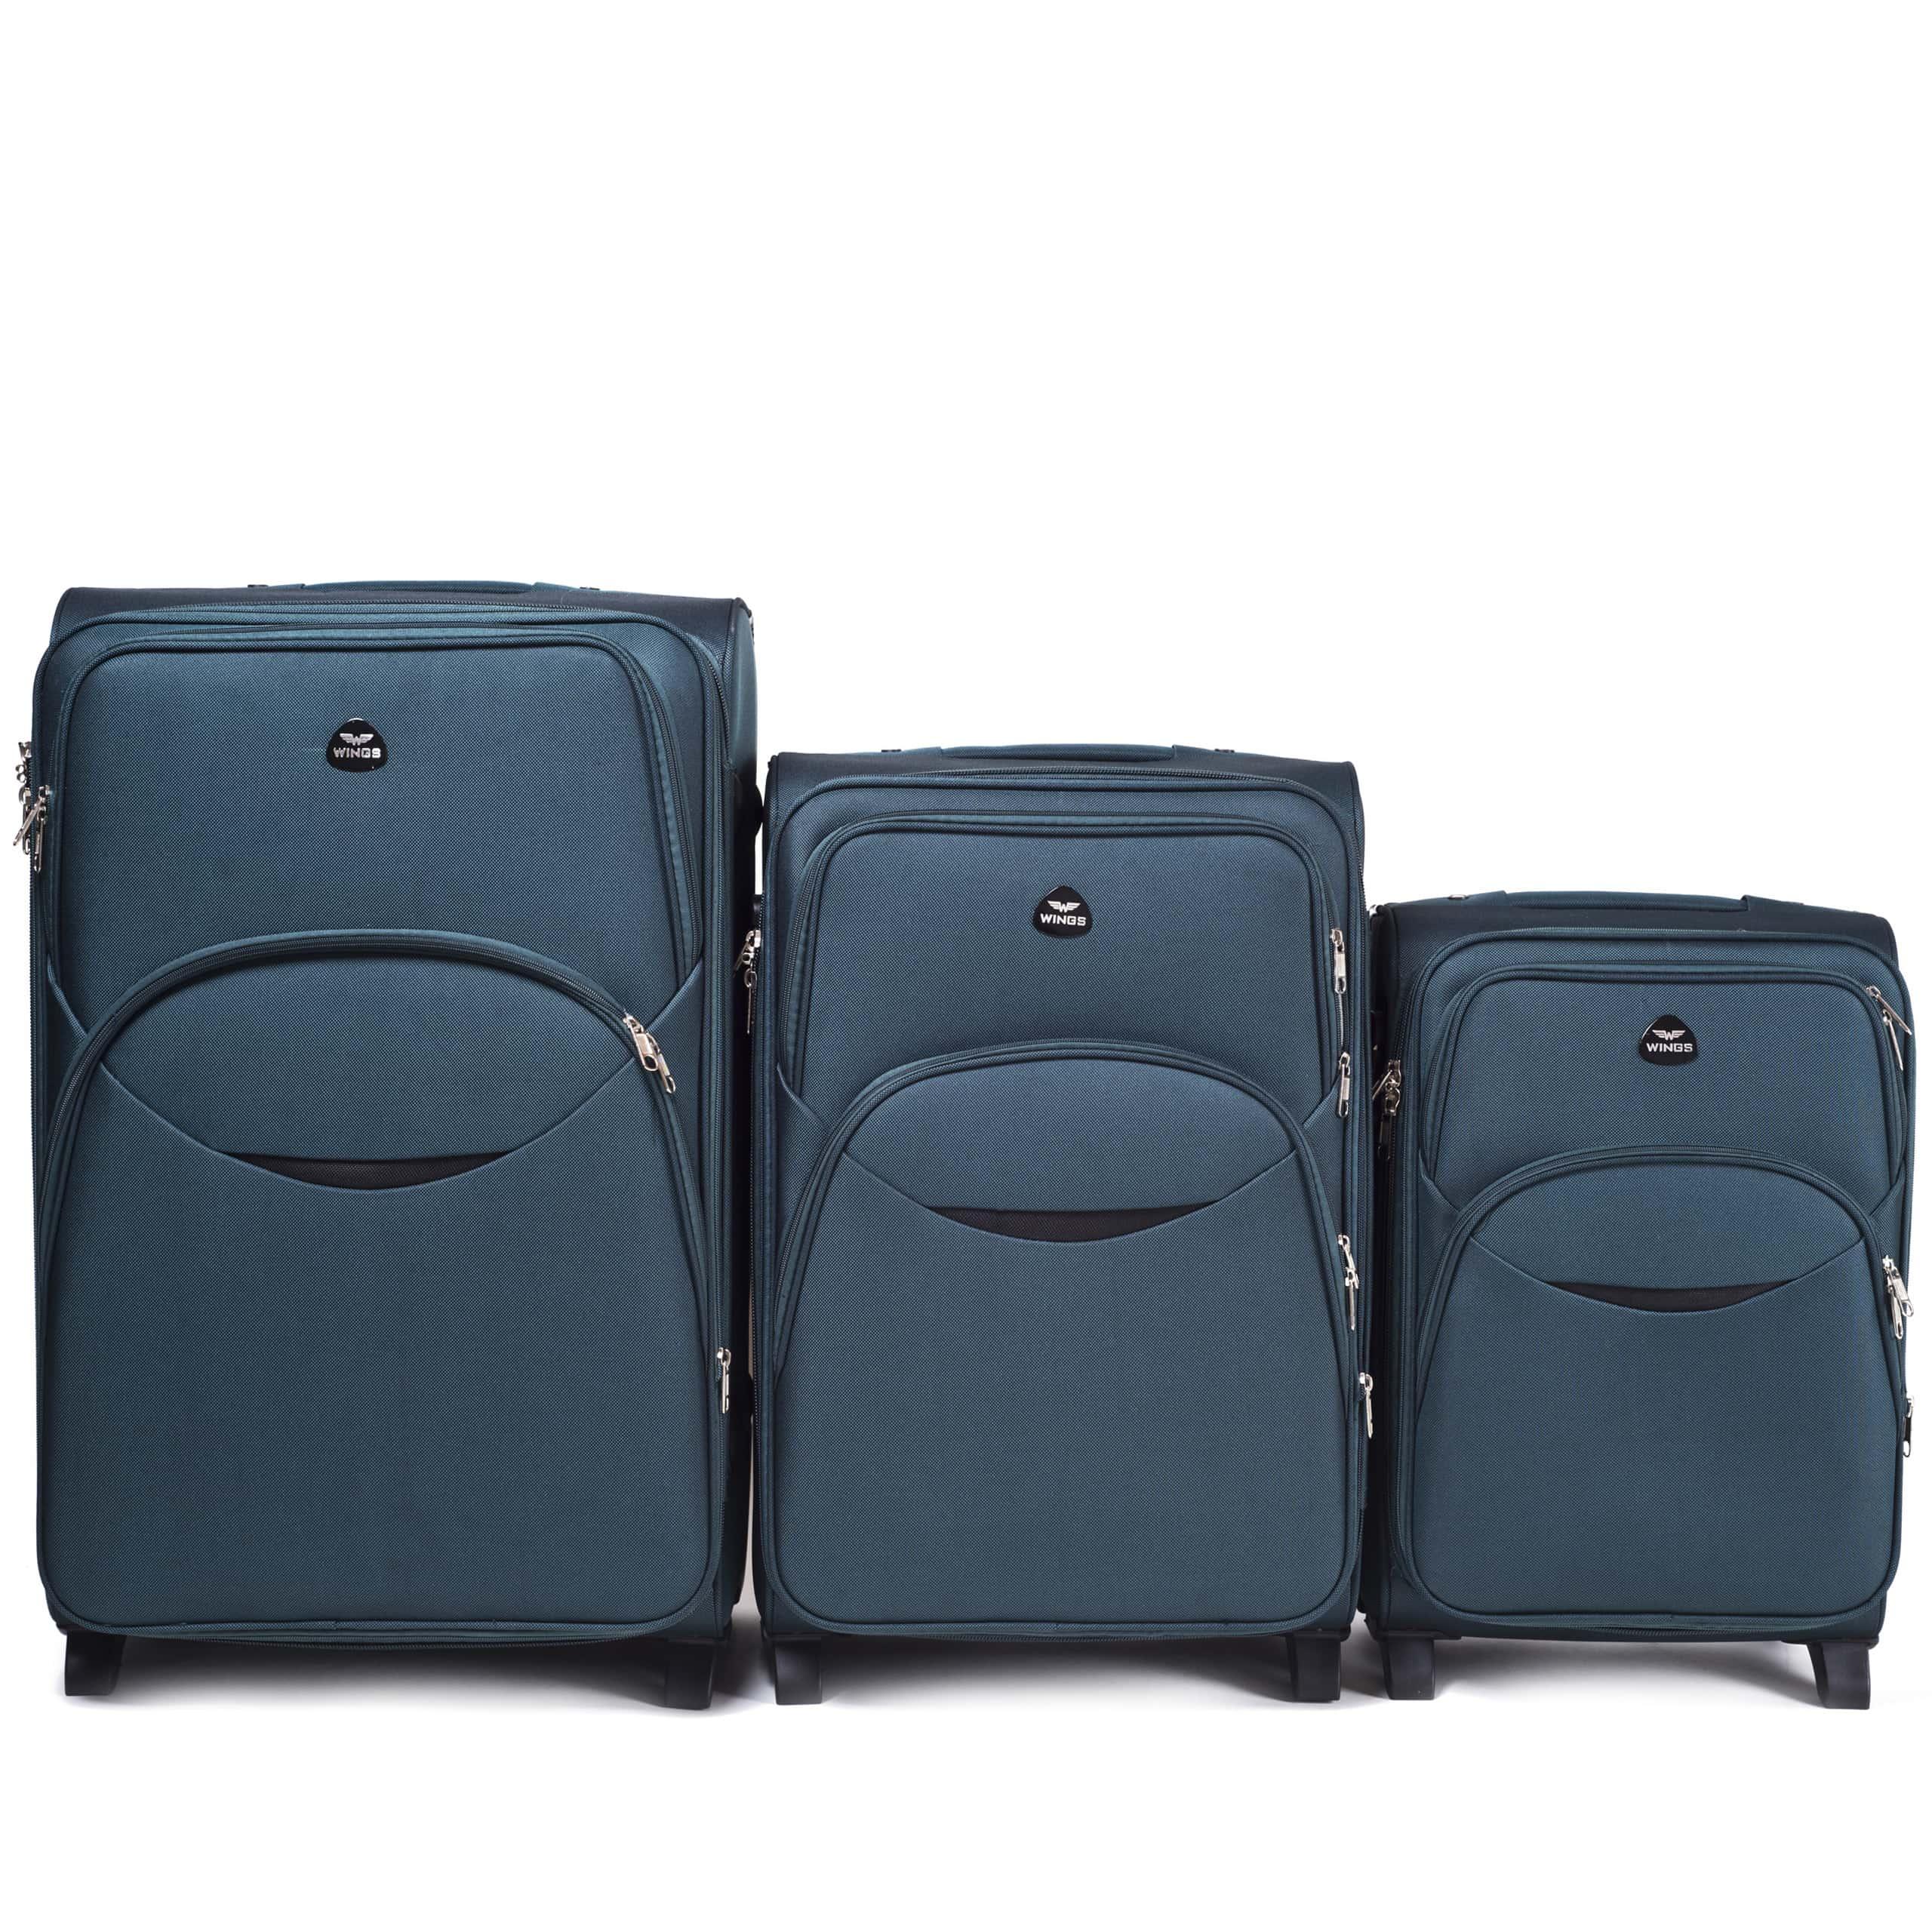 Set de valize di Textil pe 4 roti! Rezistente si usoare! 1708-2 DOUBLE GREEN